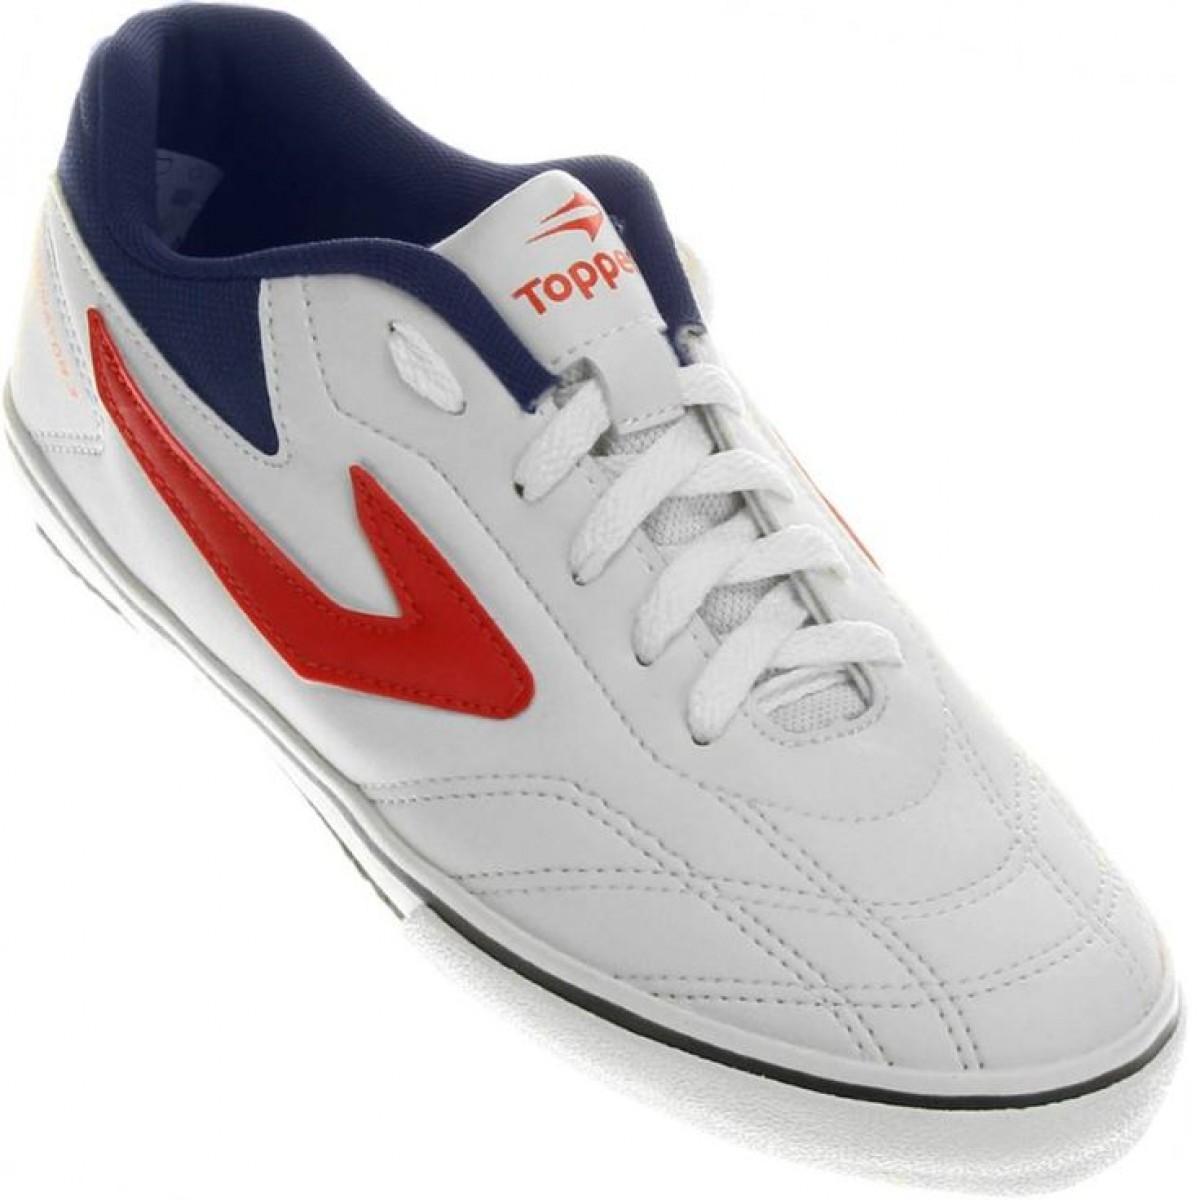 Chuteira Futsal Topper Dominator III Branco e Vermelho - Masculino ... 256e529c157a3